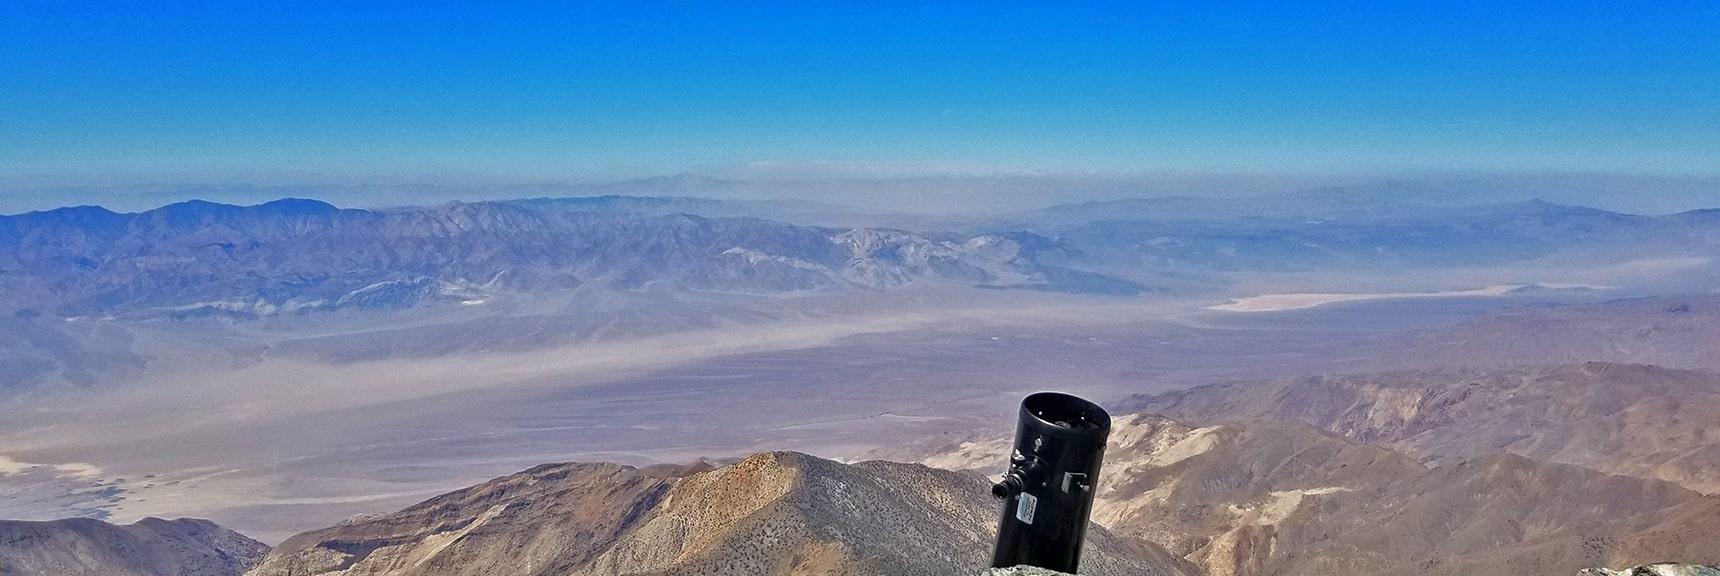 View Northwest from Telescope Peak Summit. Salten Sea Valley Below. Sierra Nevada Mts. Faint on Horizon   Telescope Peak Summit from Wildrose Charcoal Kilns Parking Area, Panamint Mountains, Death Valley National Park, California